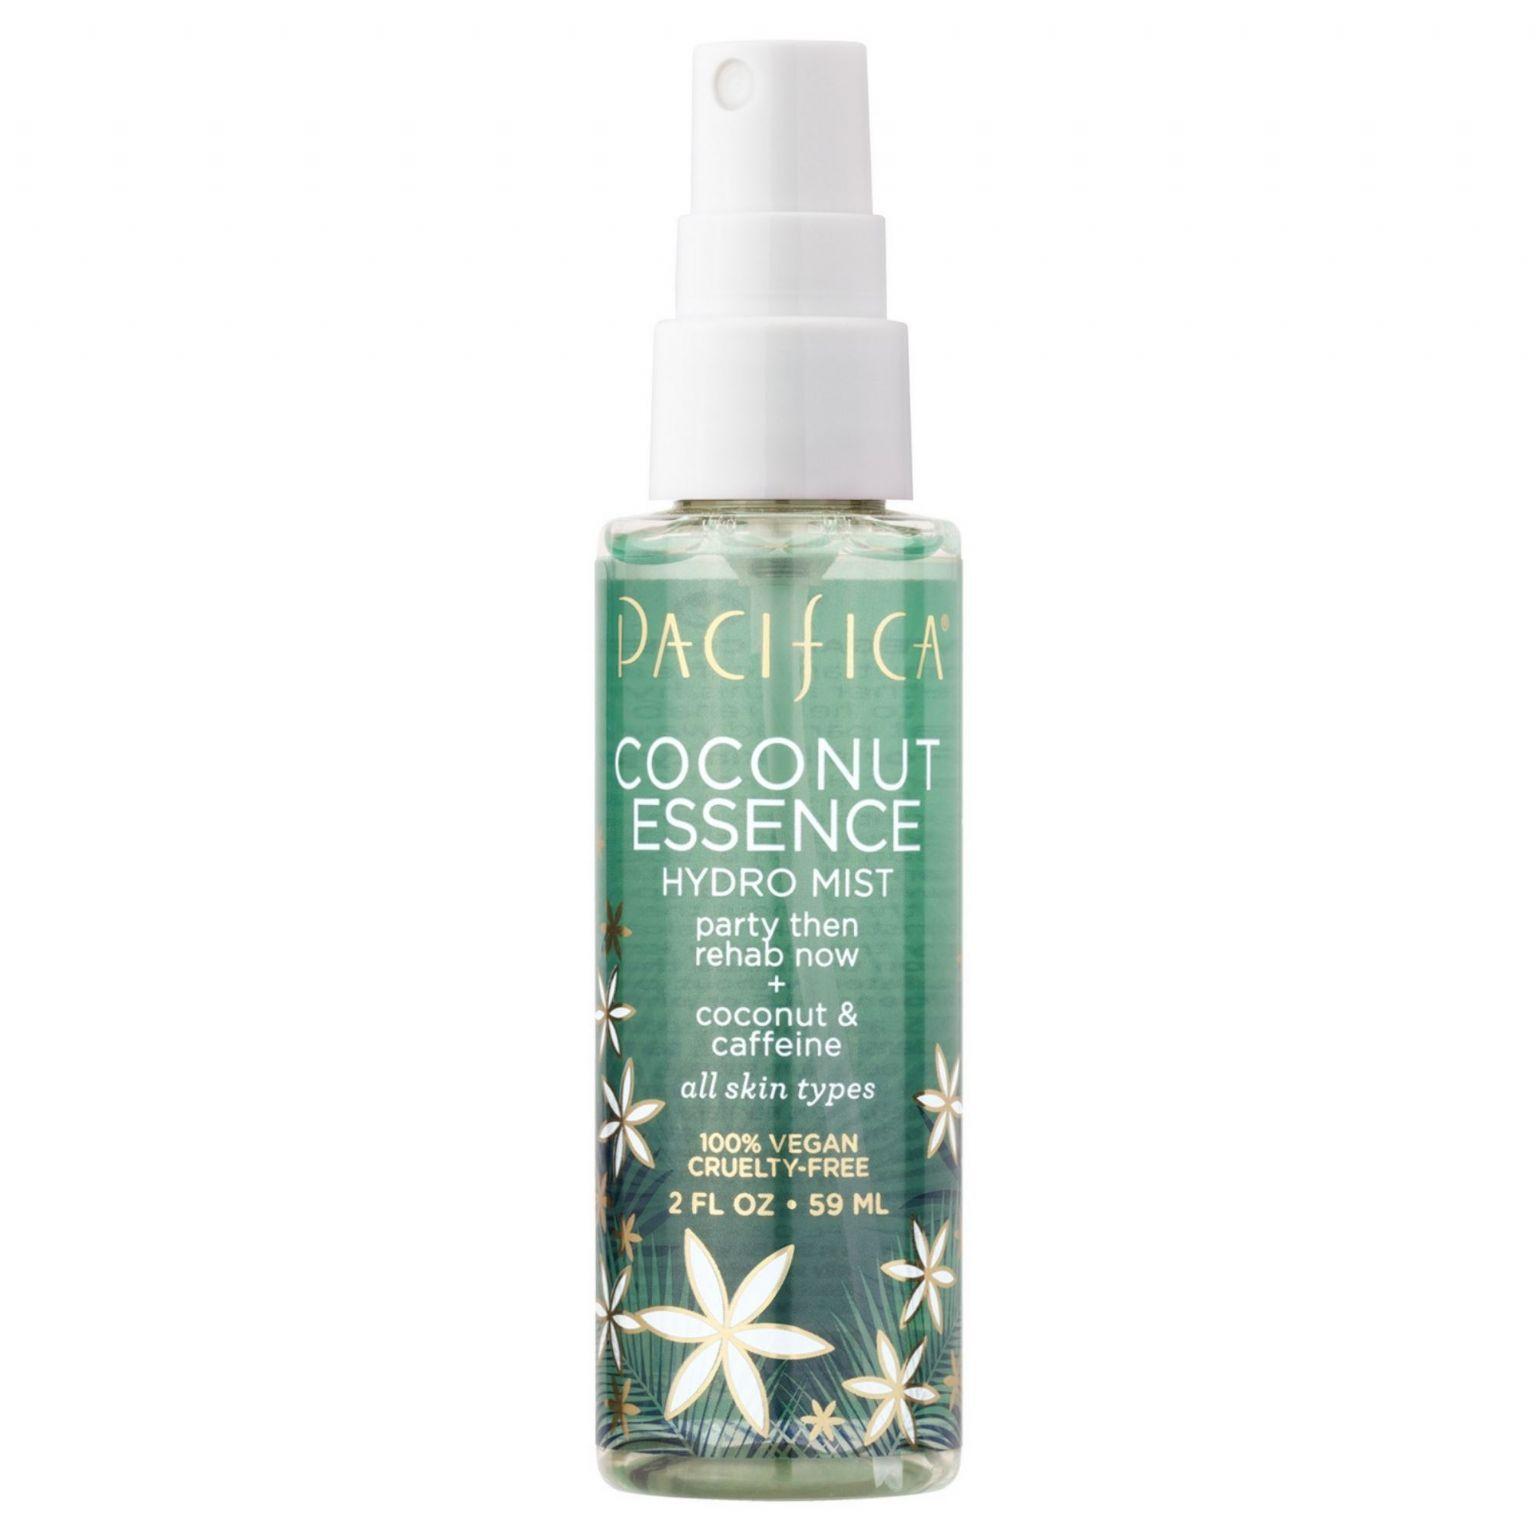 Coconut Essence Hydro Mist